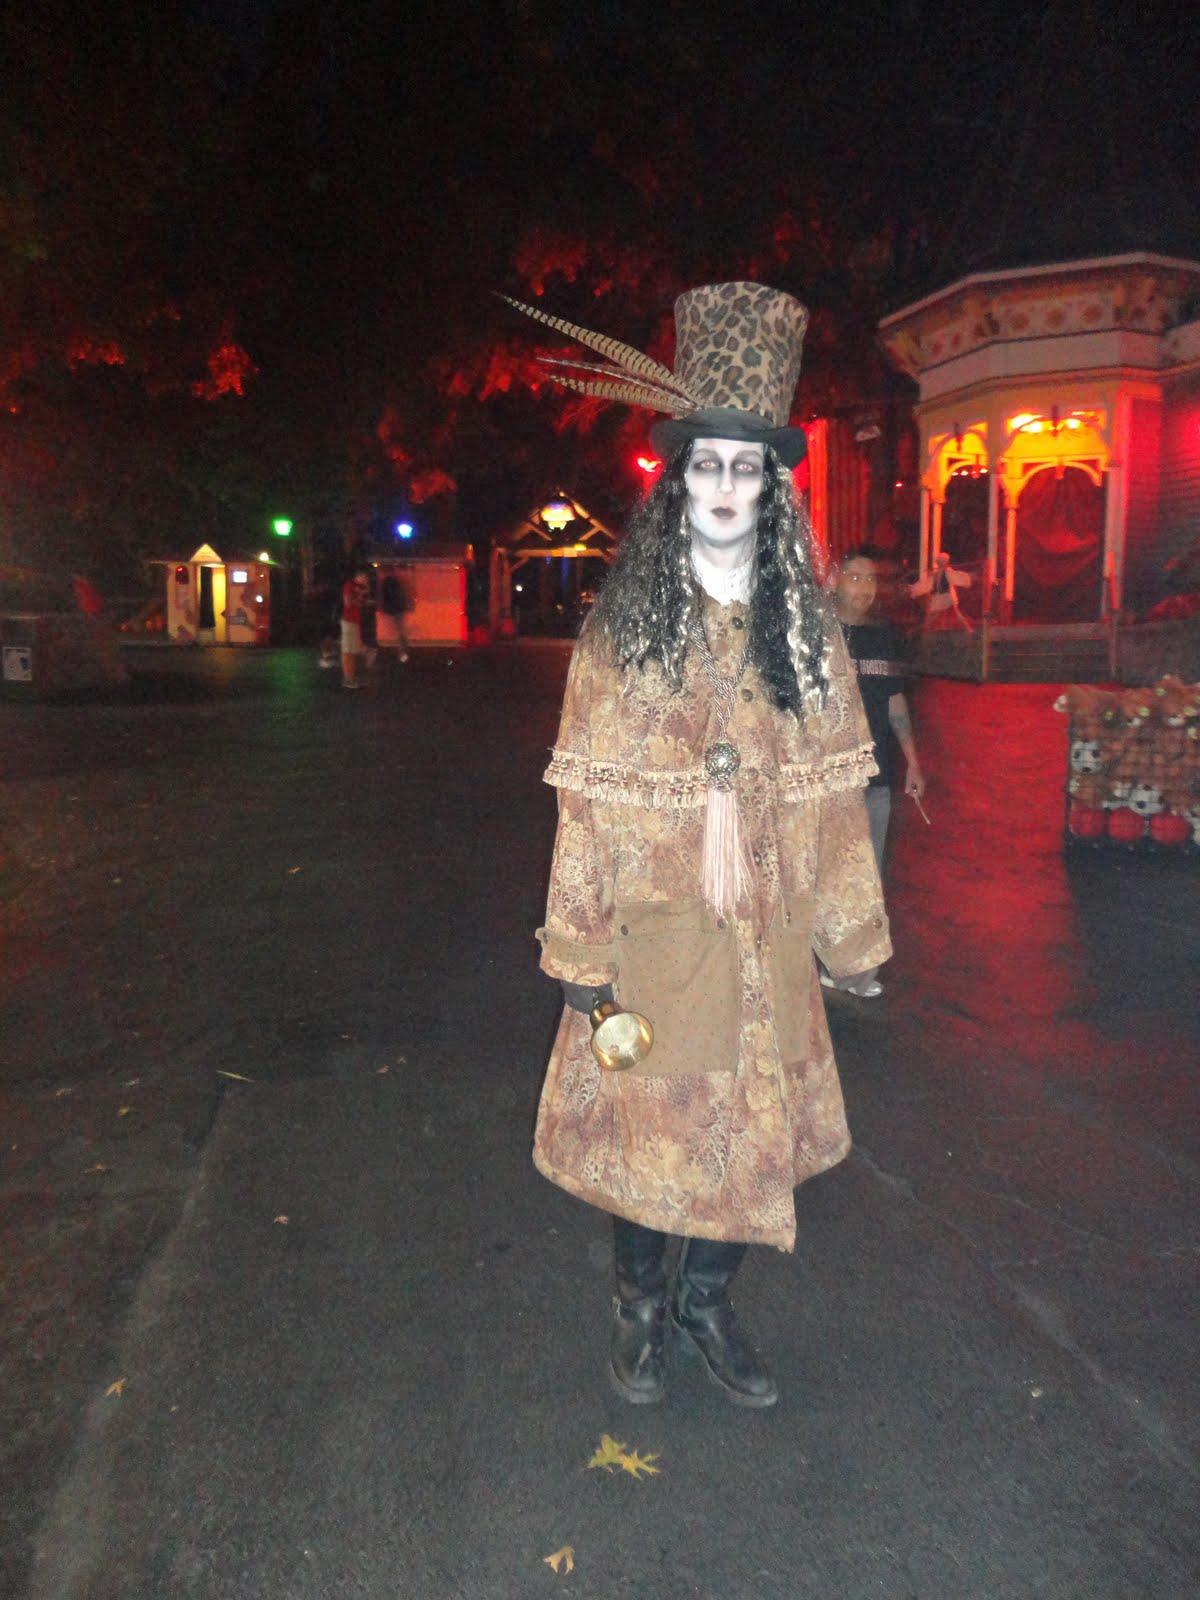 worlds of fun: halloween haunt third weekend review